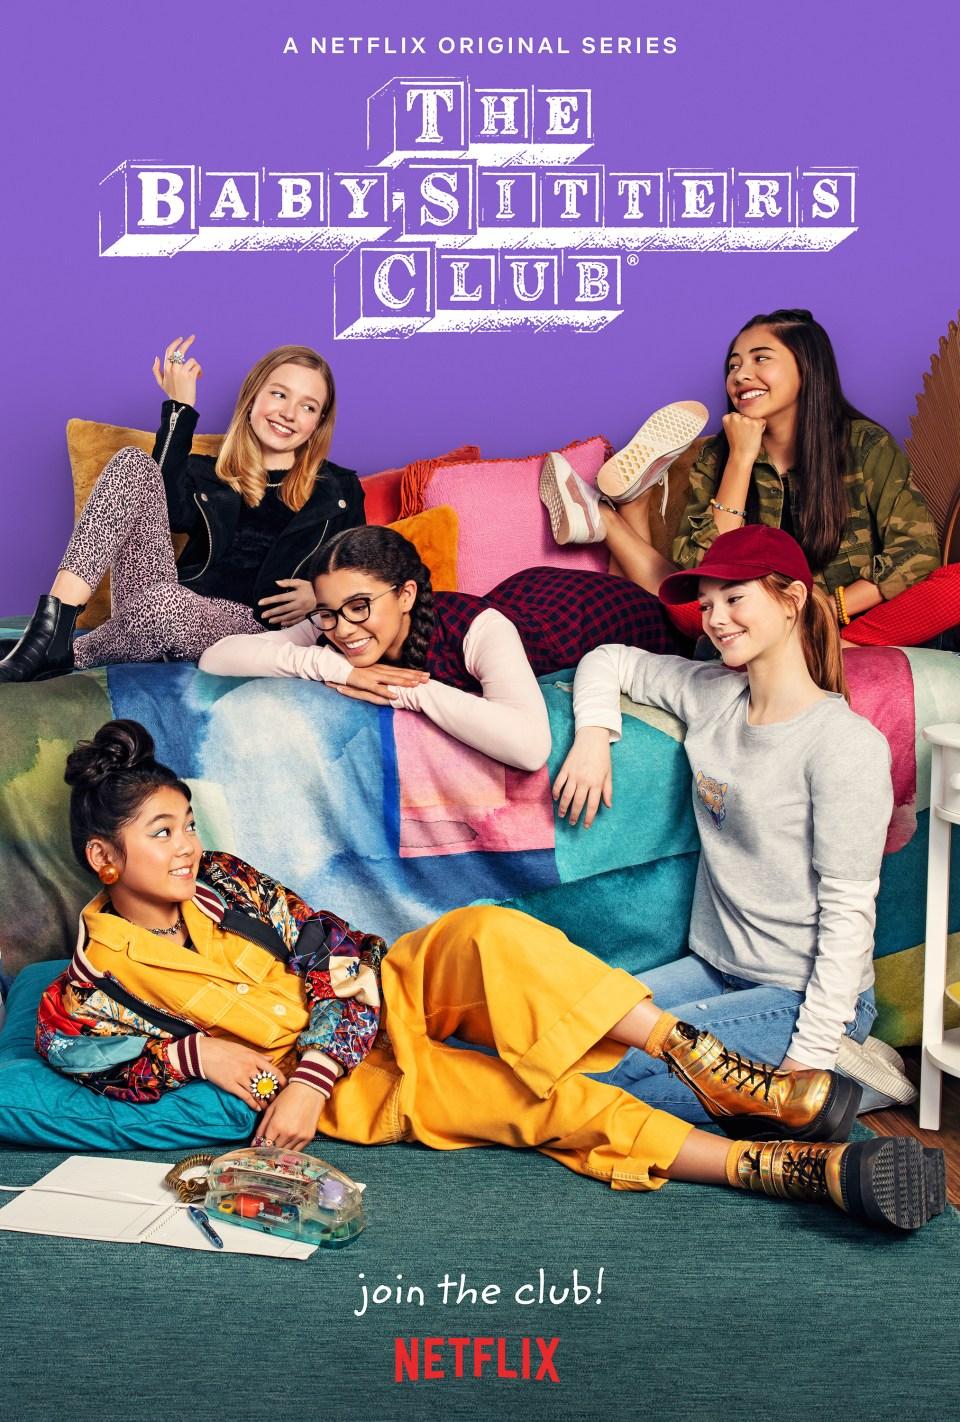 netflix babysitters club